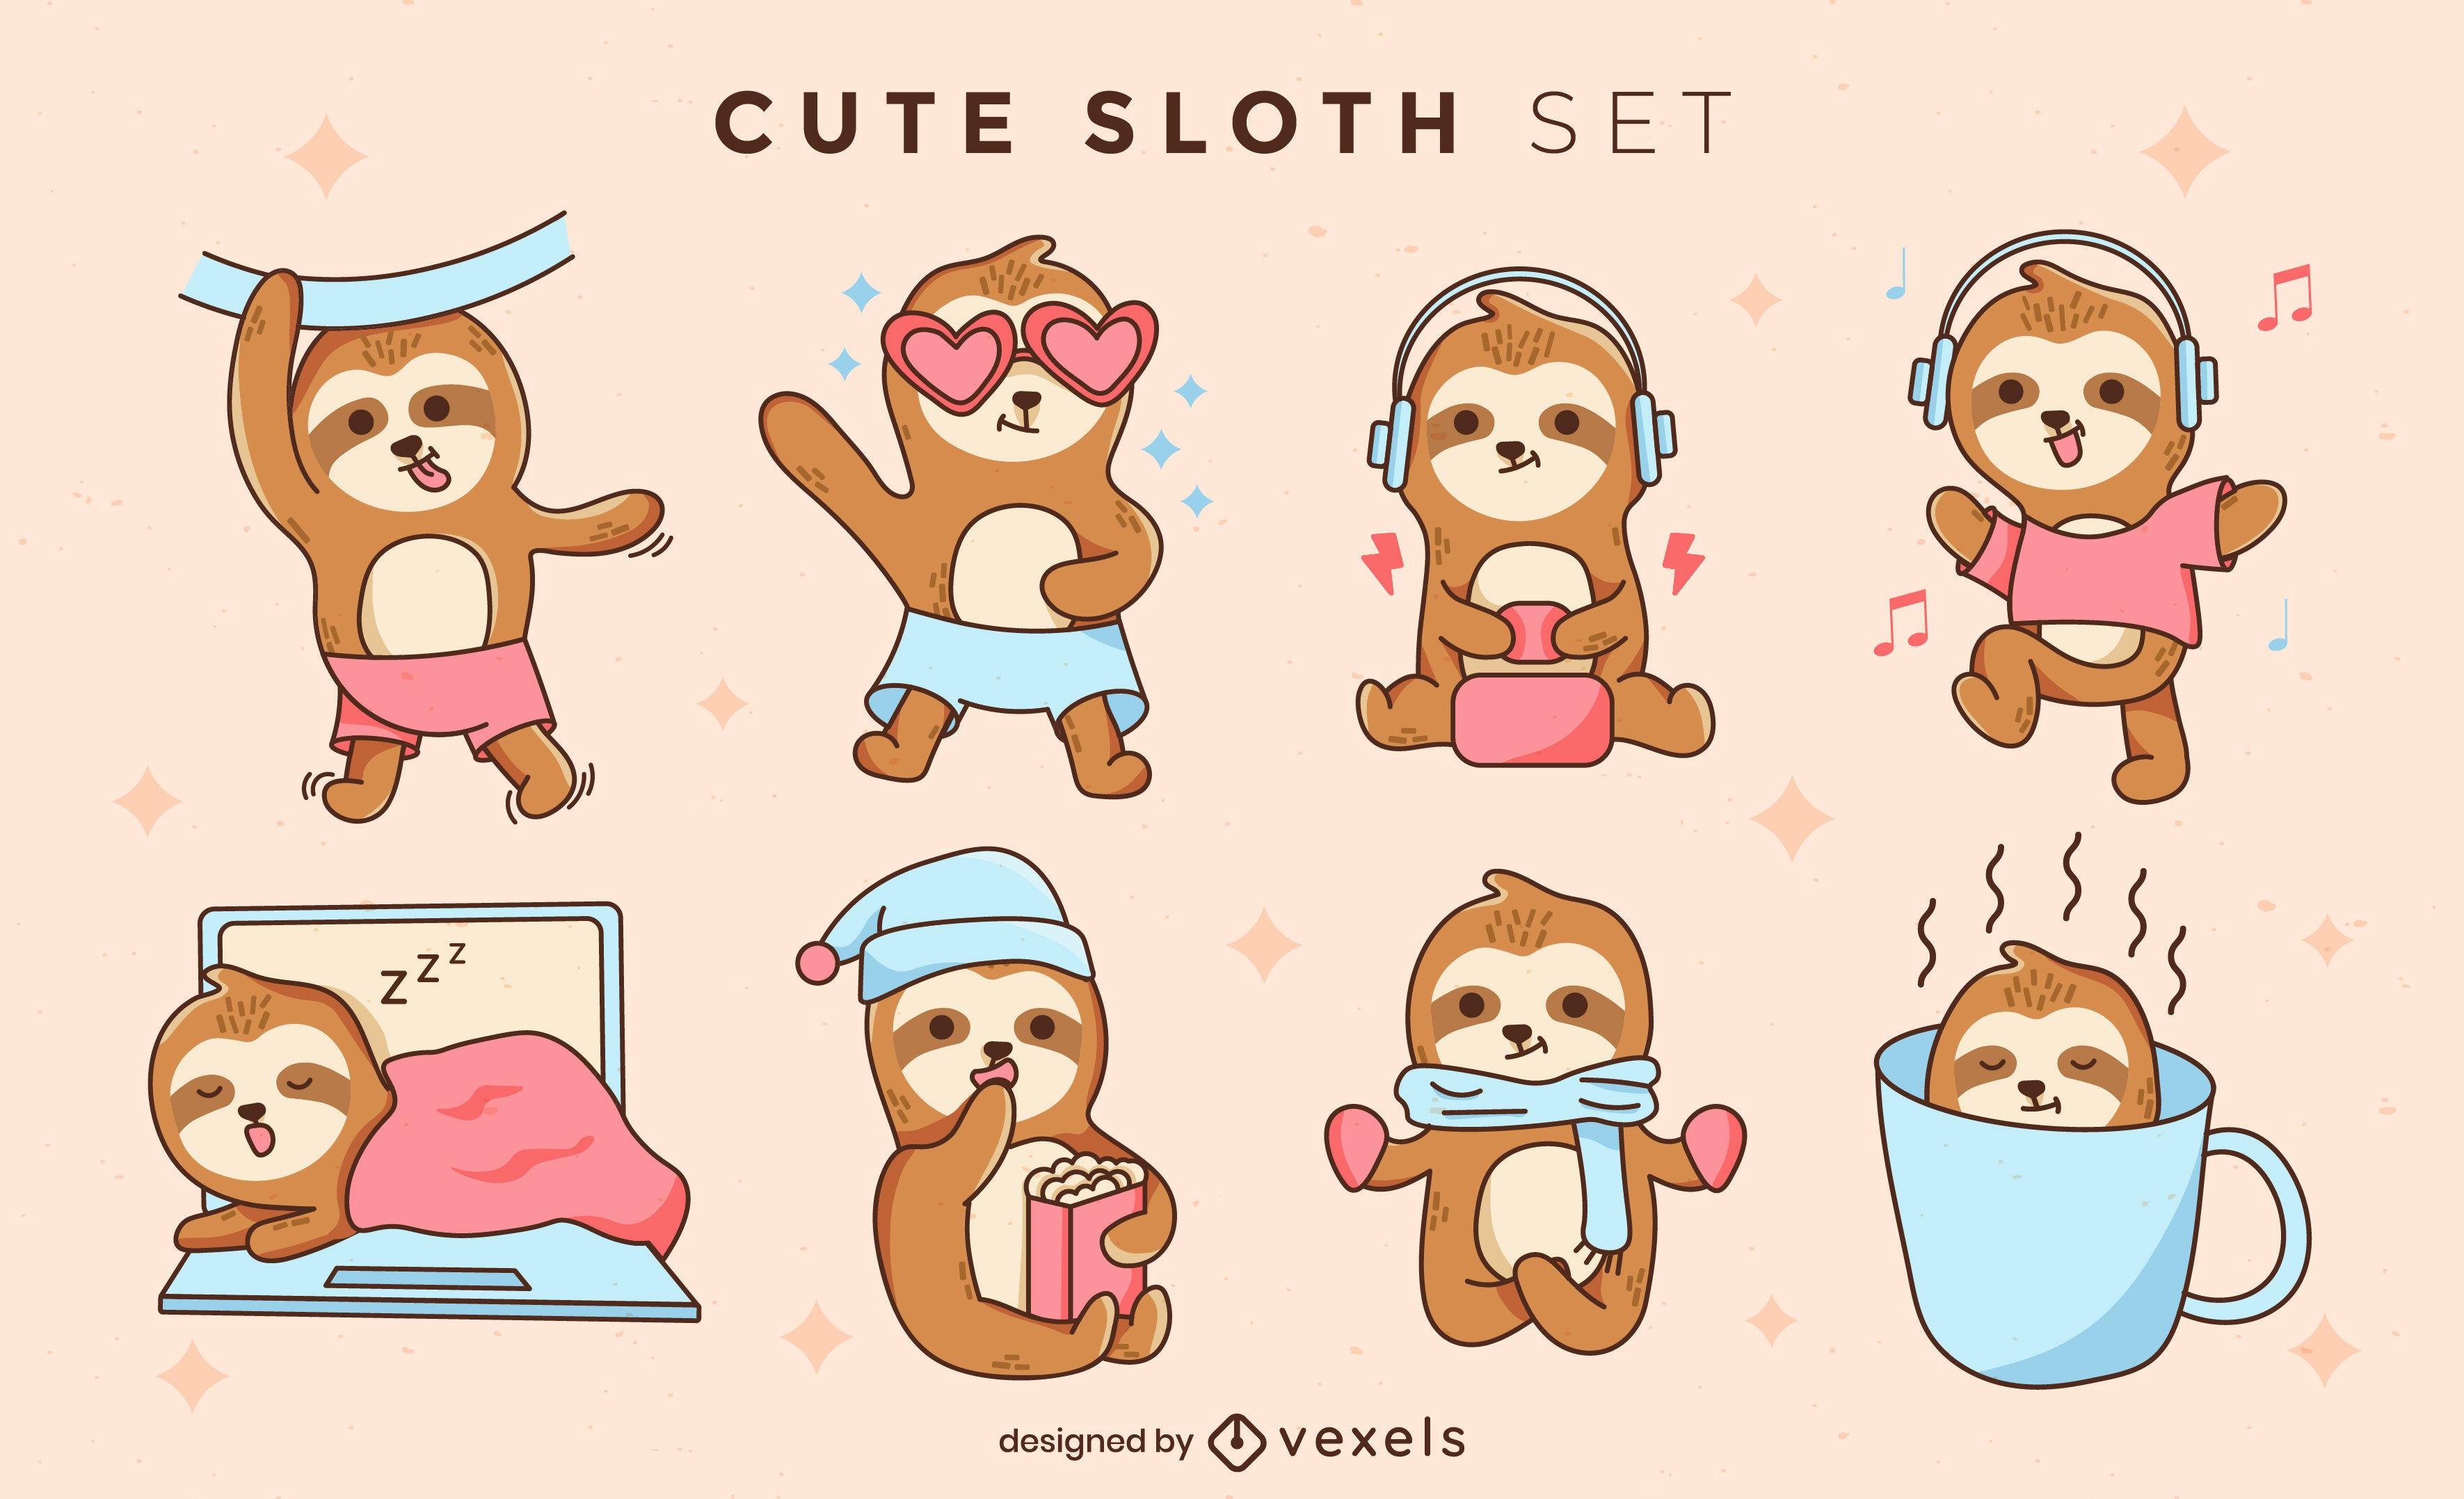 Cute sloth character illustration set design